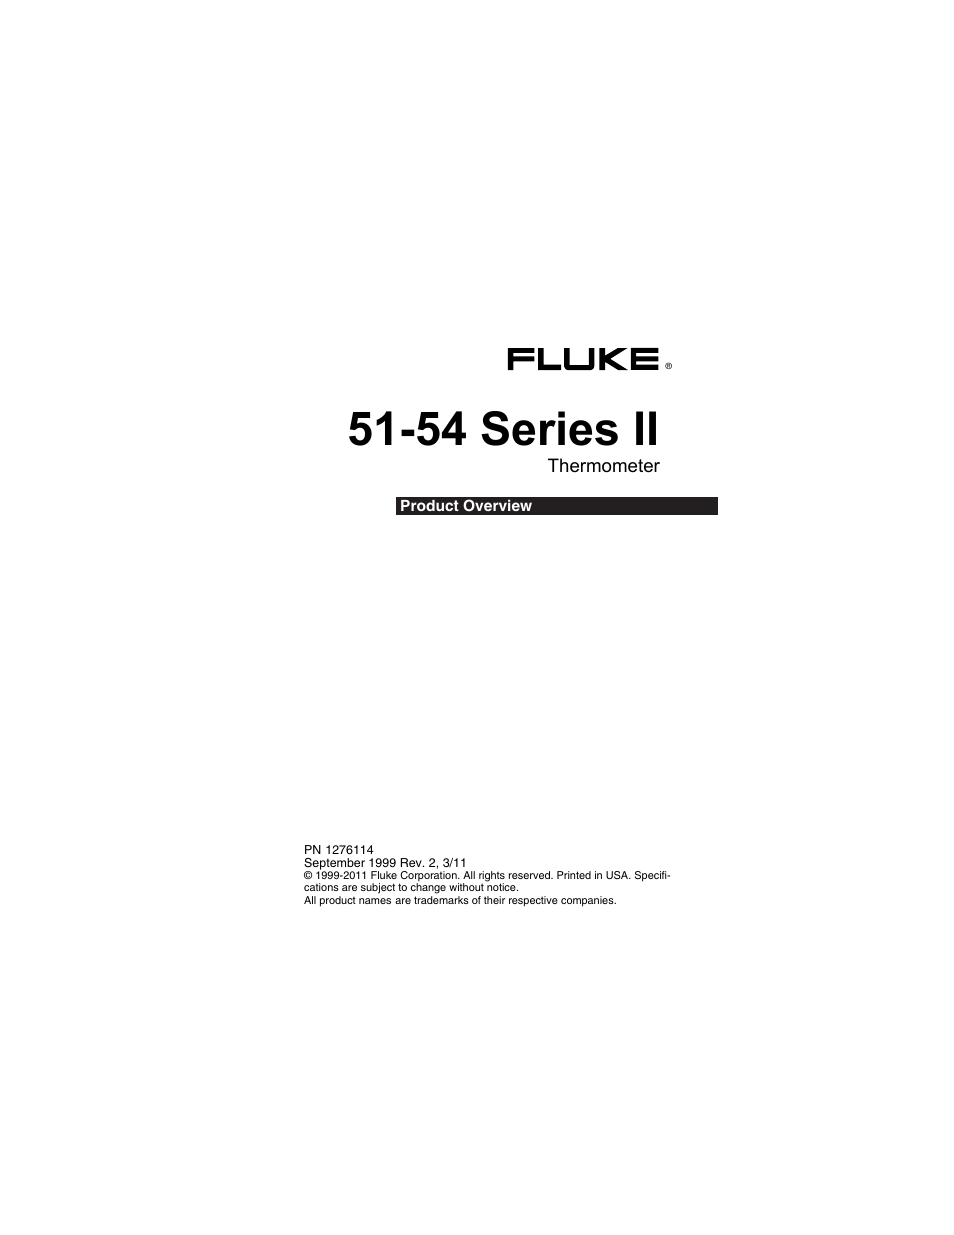 Fluke 525a user manual pdf download manualslibcom dinocro. Info.